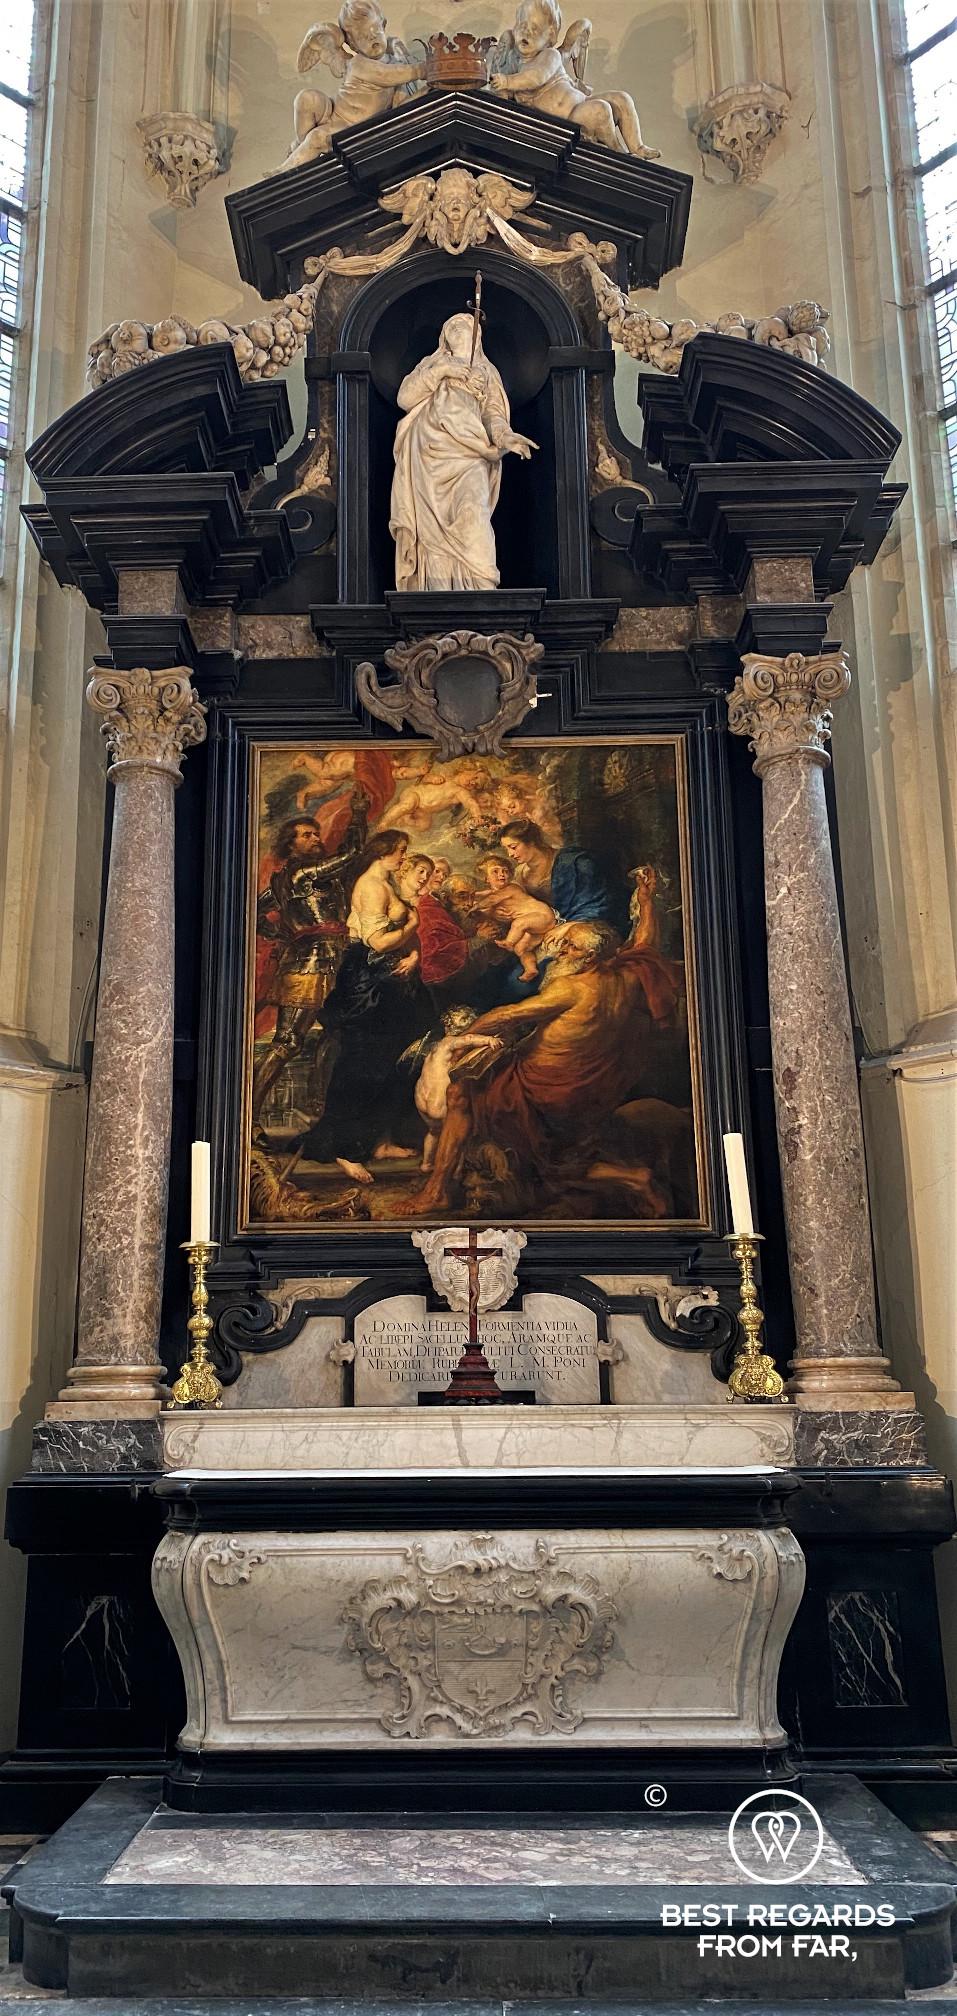 Holy Virgin with Saints (1634) by Rubens, Saint James Church, Antwerp, in the burial chapel of Rubens